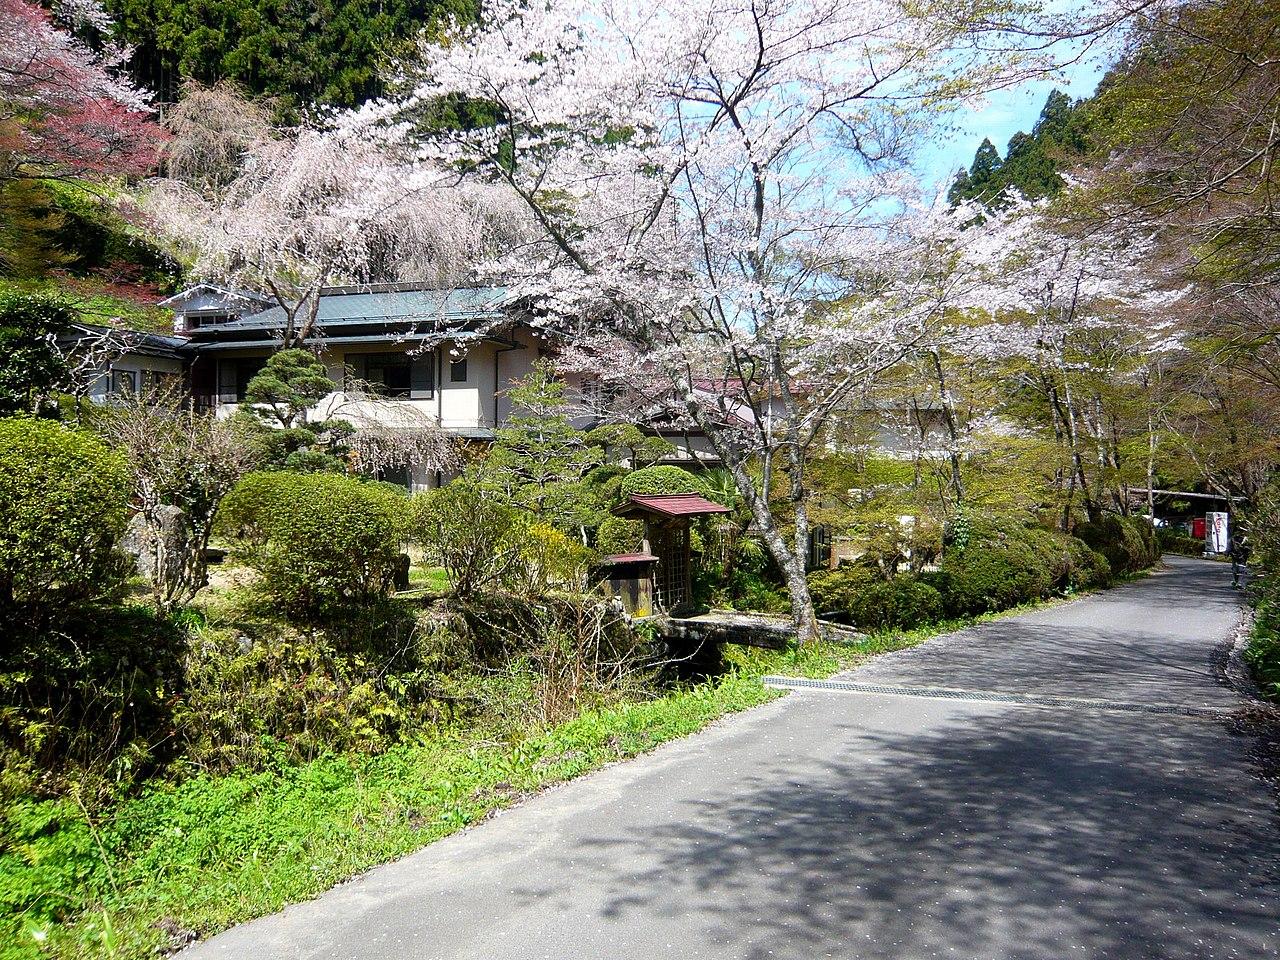 吉野温泉元湯 Yoshino-onsen 2010.4.08 - panoramio.jpg